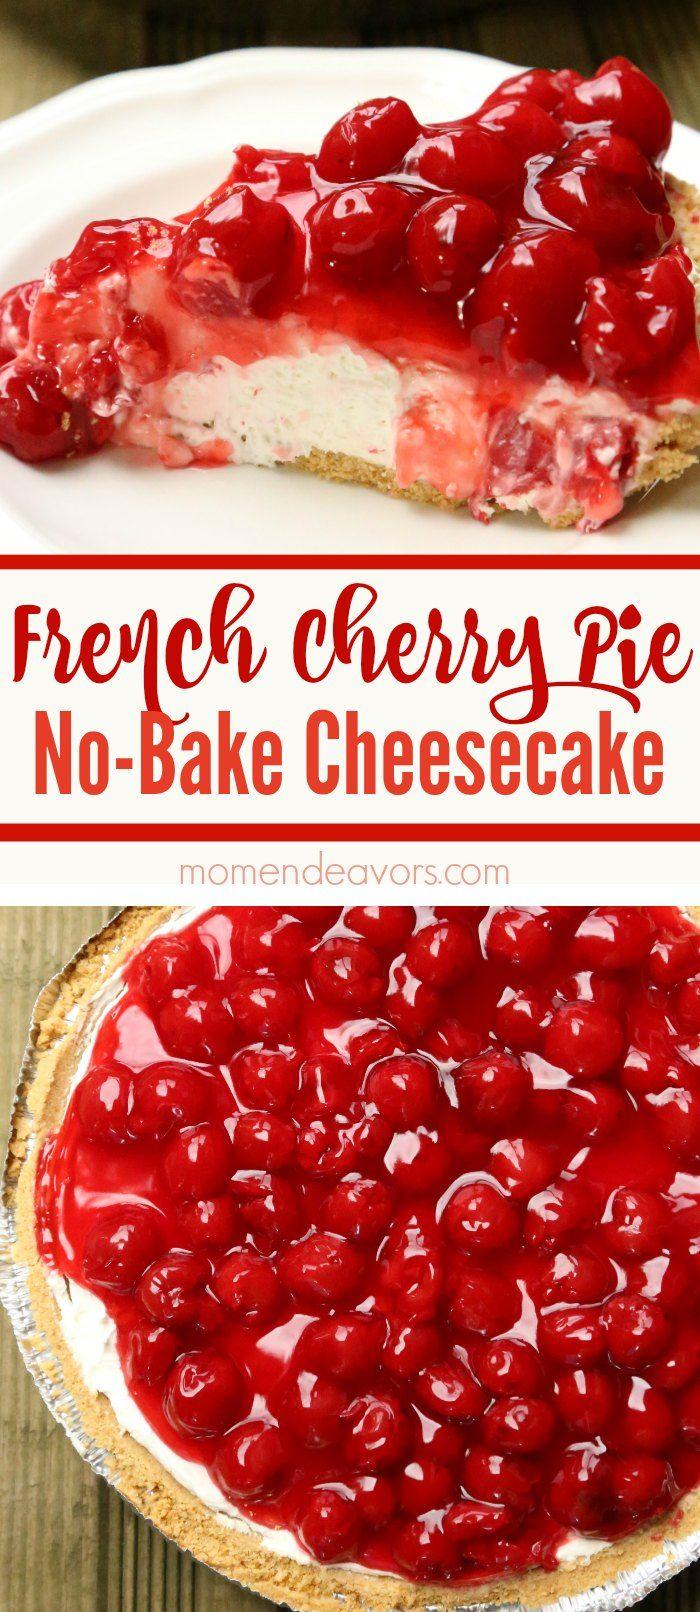 Grandma's French Cherry Pie - Mom Endeavors